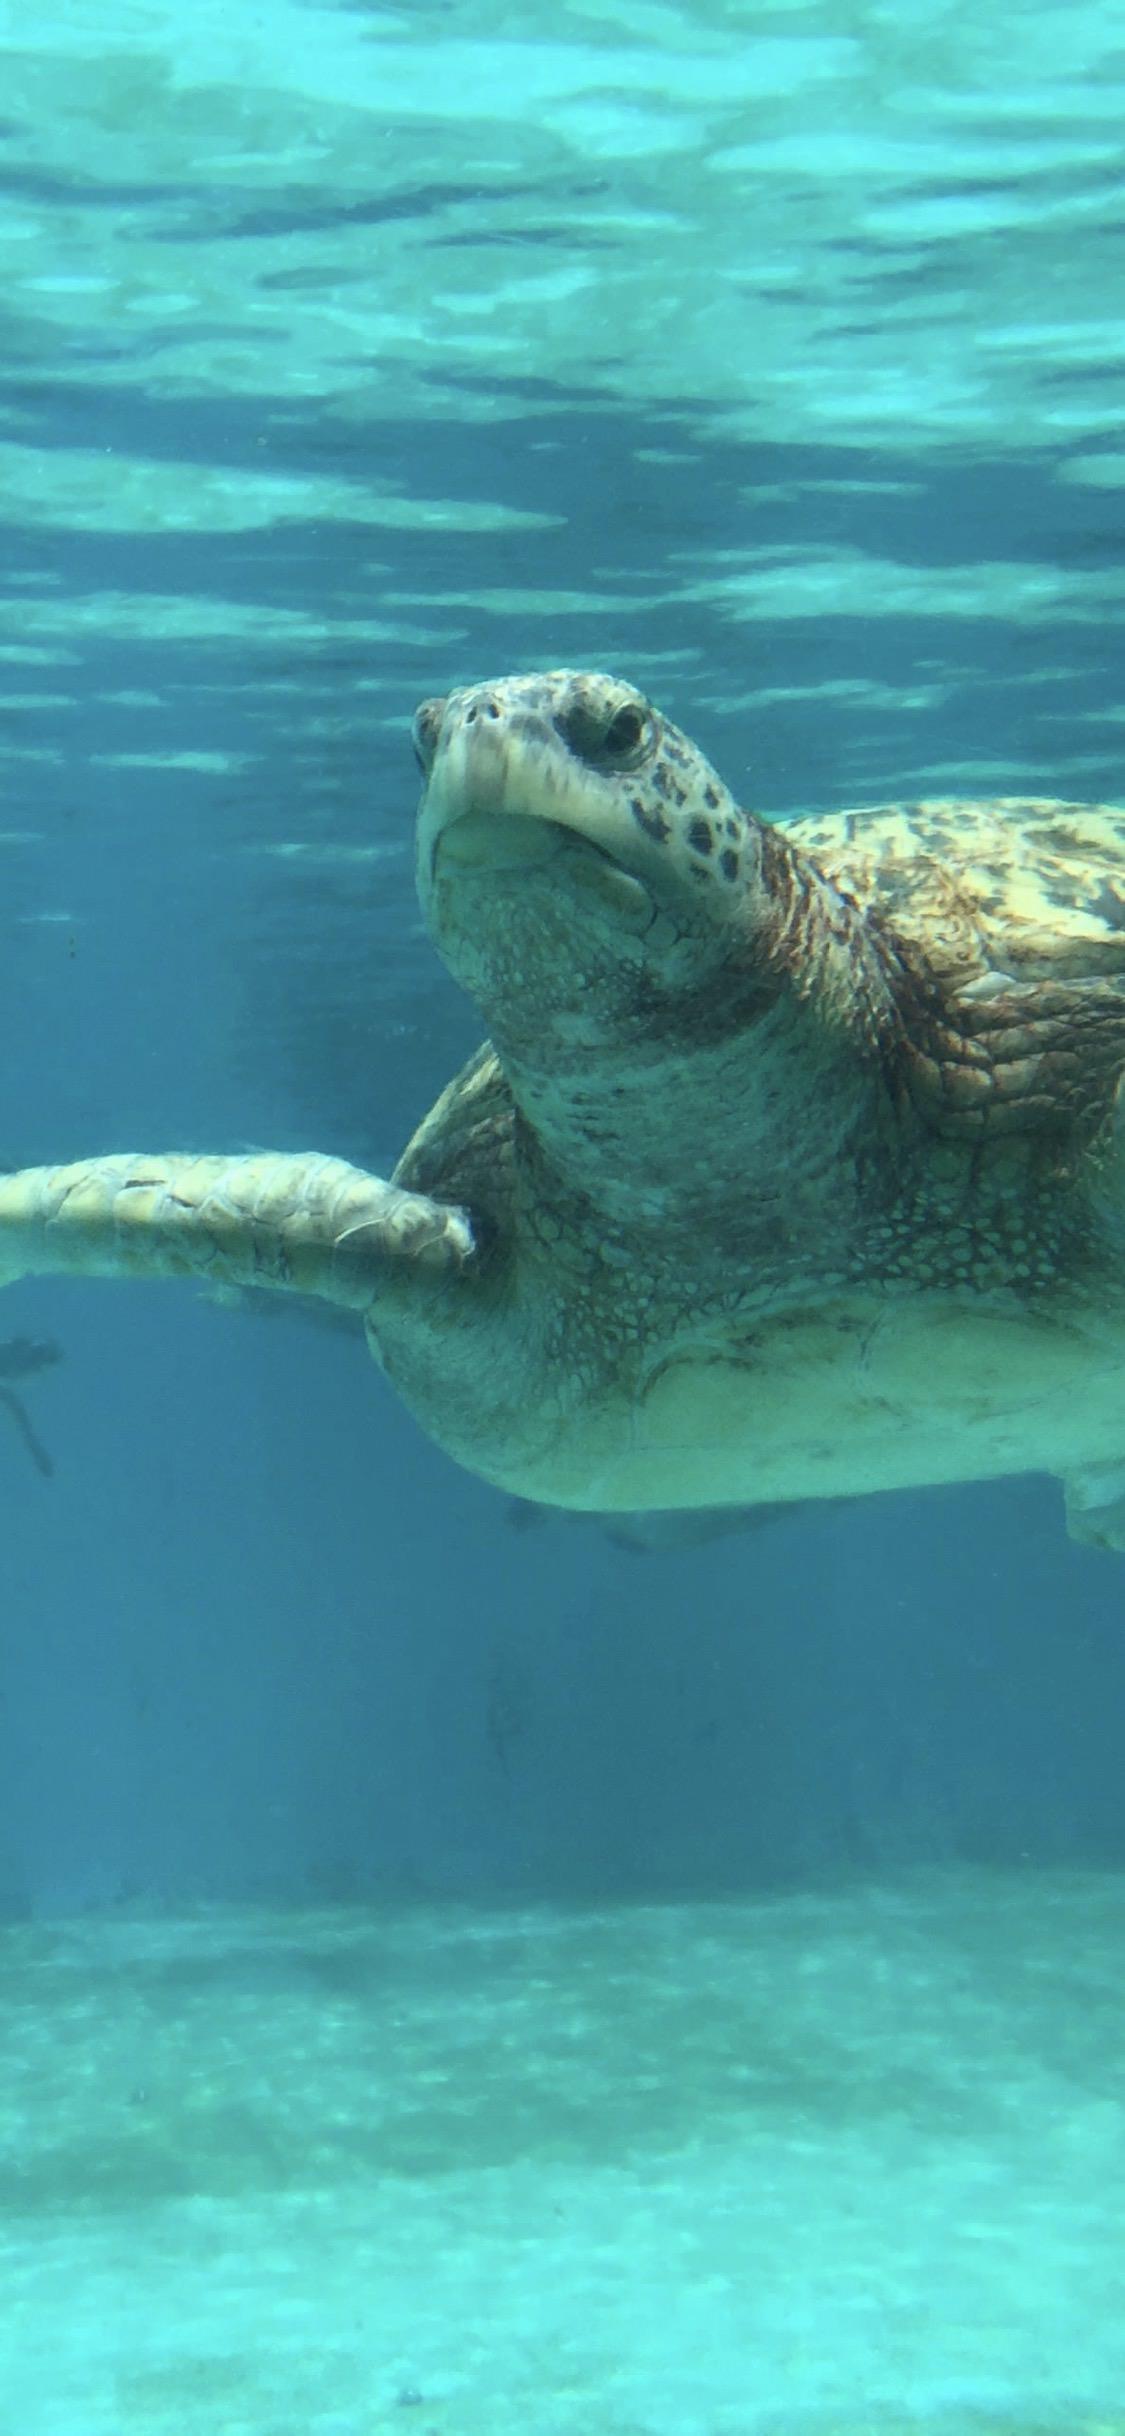 Una simpatica tartaruga marina - Sfondi per iPhone, i migliori da scaricare gratis